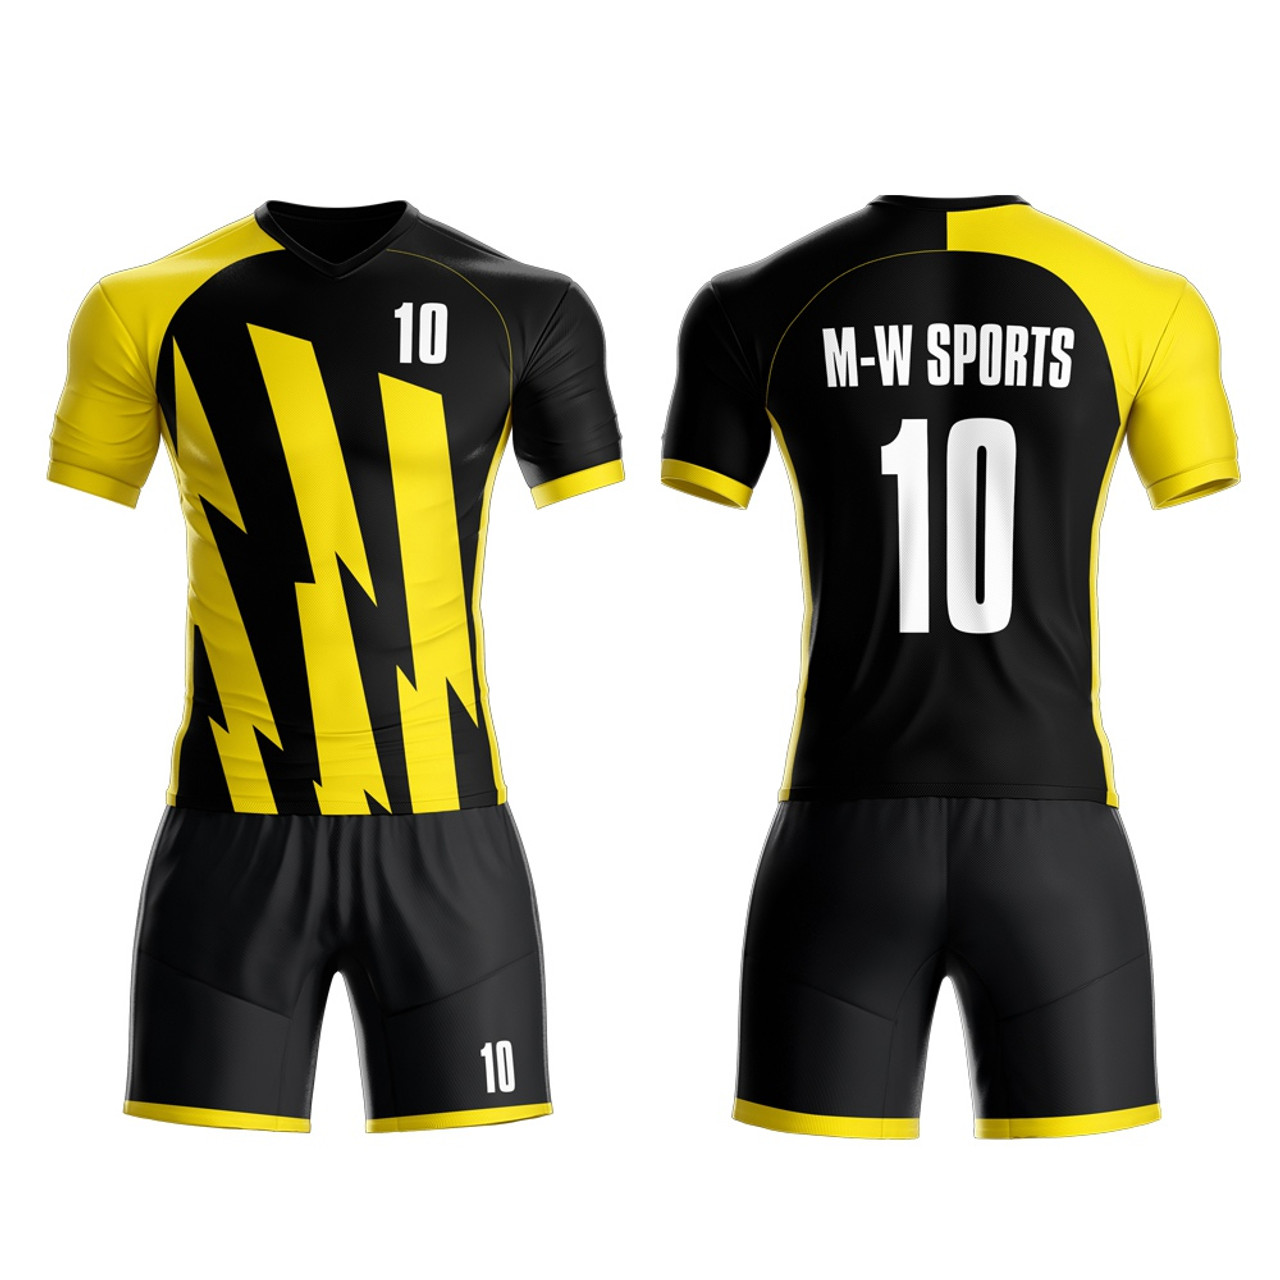 sports jersey design